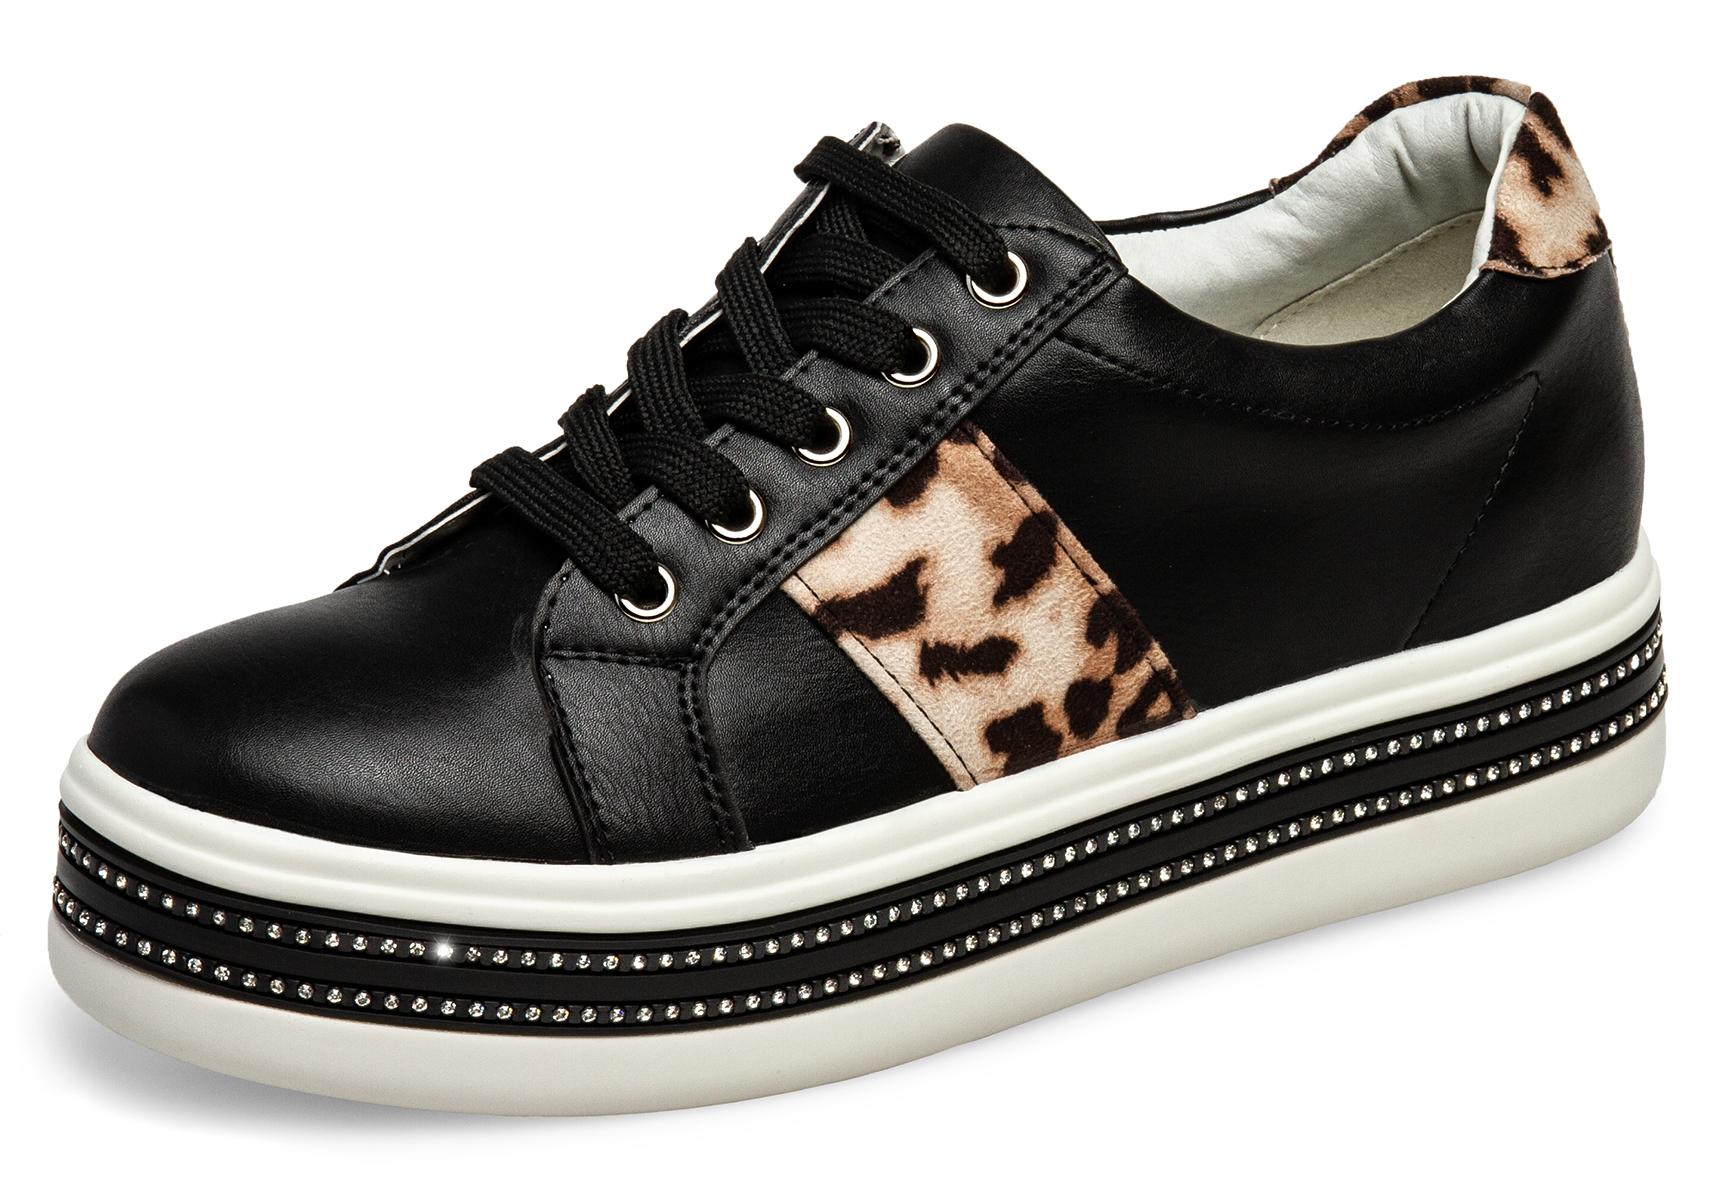 wholesale dealer d5e4f d4833 Caspar SBO095 Damen Glitzer Strass Leo Plateau Sneaker Low ...